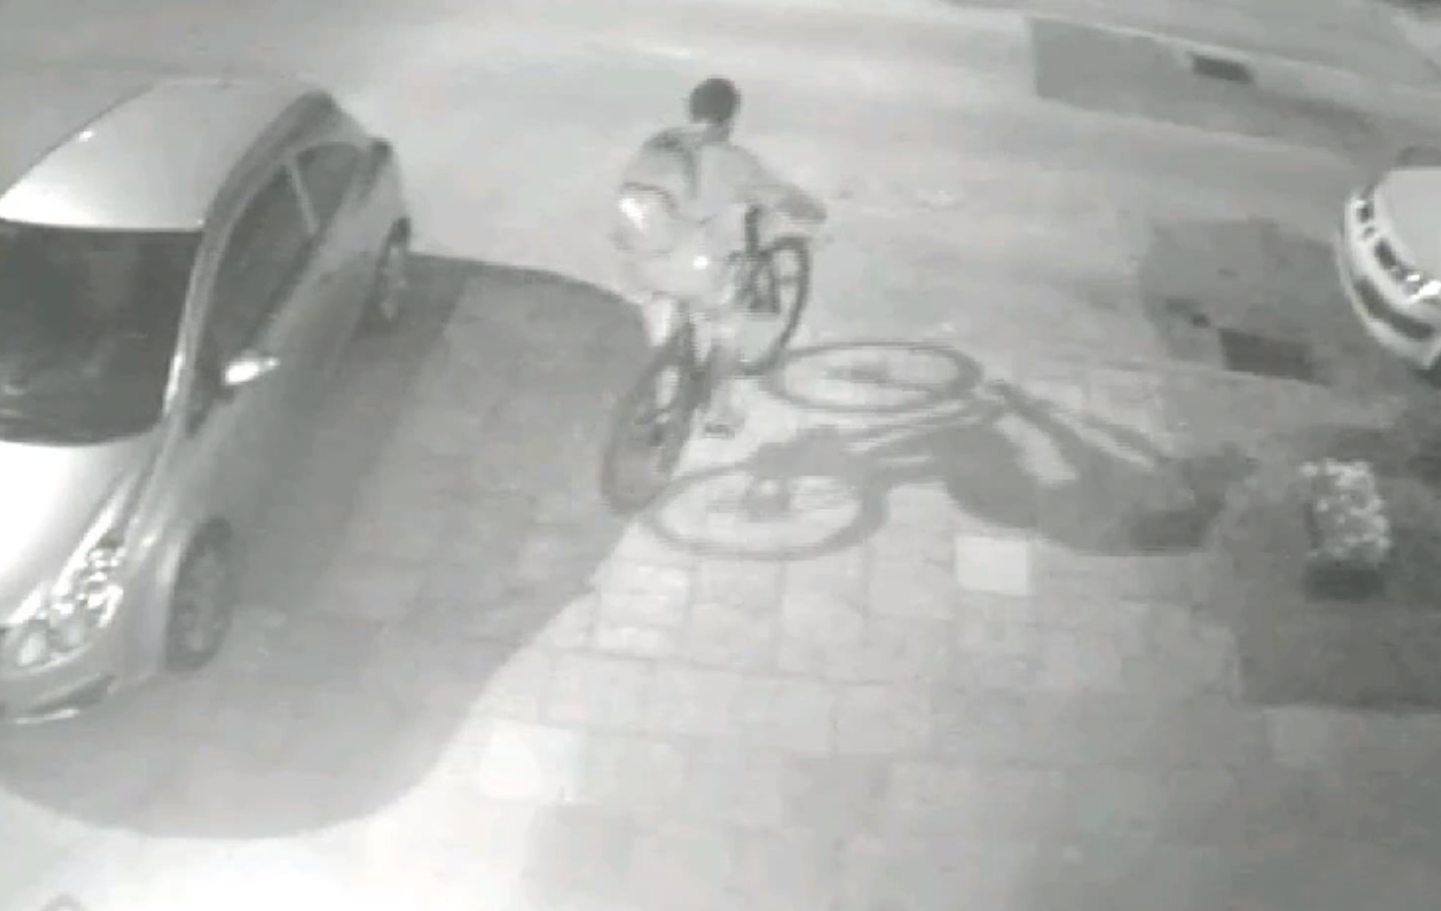 2018-07-12_19-59_Lublin- Ukradł rower. Kto go